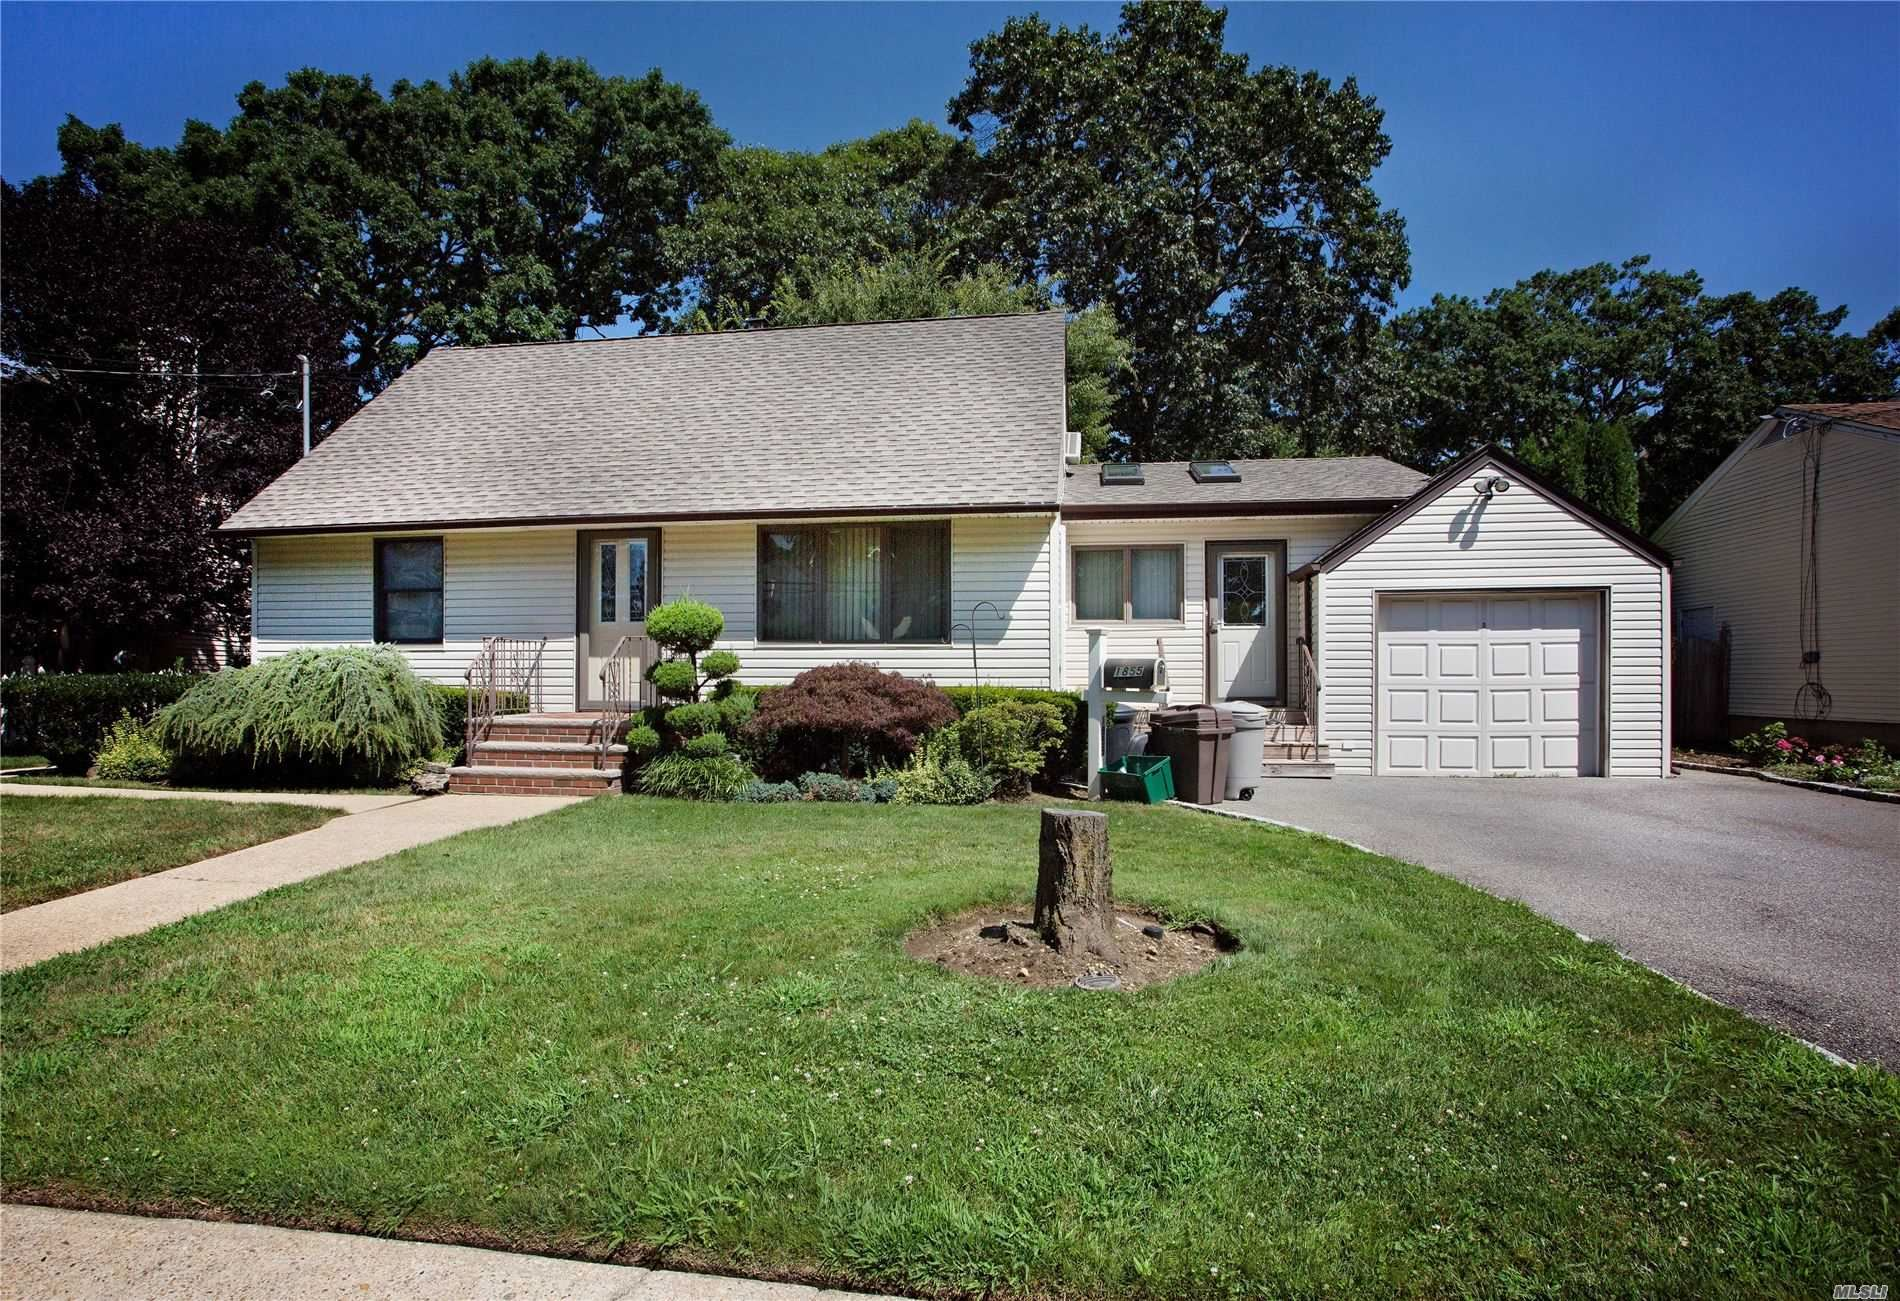 1855 Willis Avenue, Merrick, NY 11566 - MLS#: 3240899